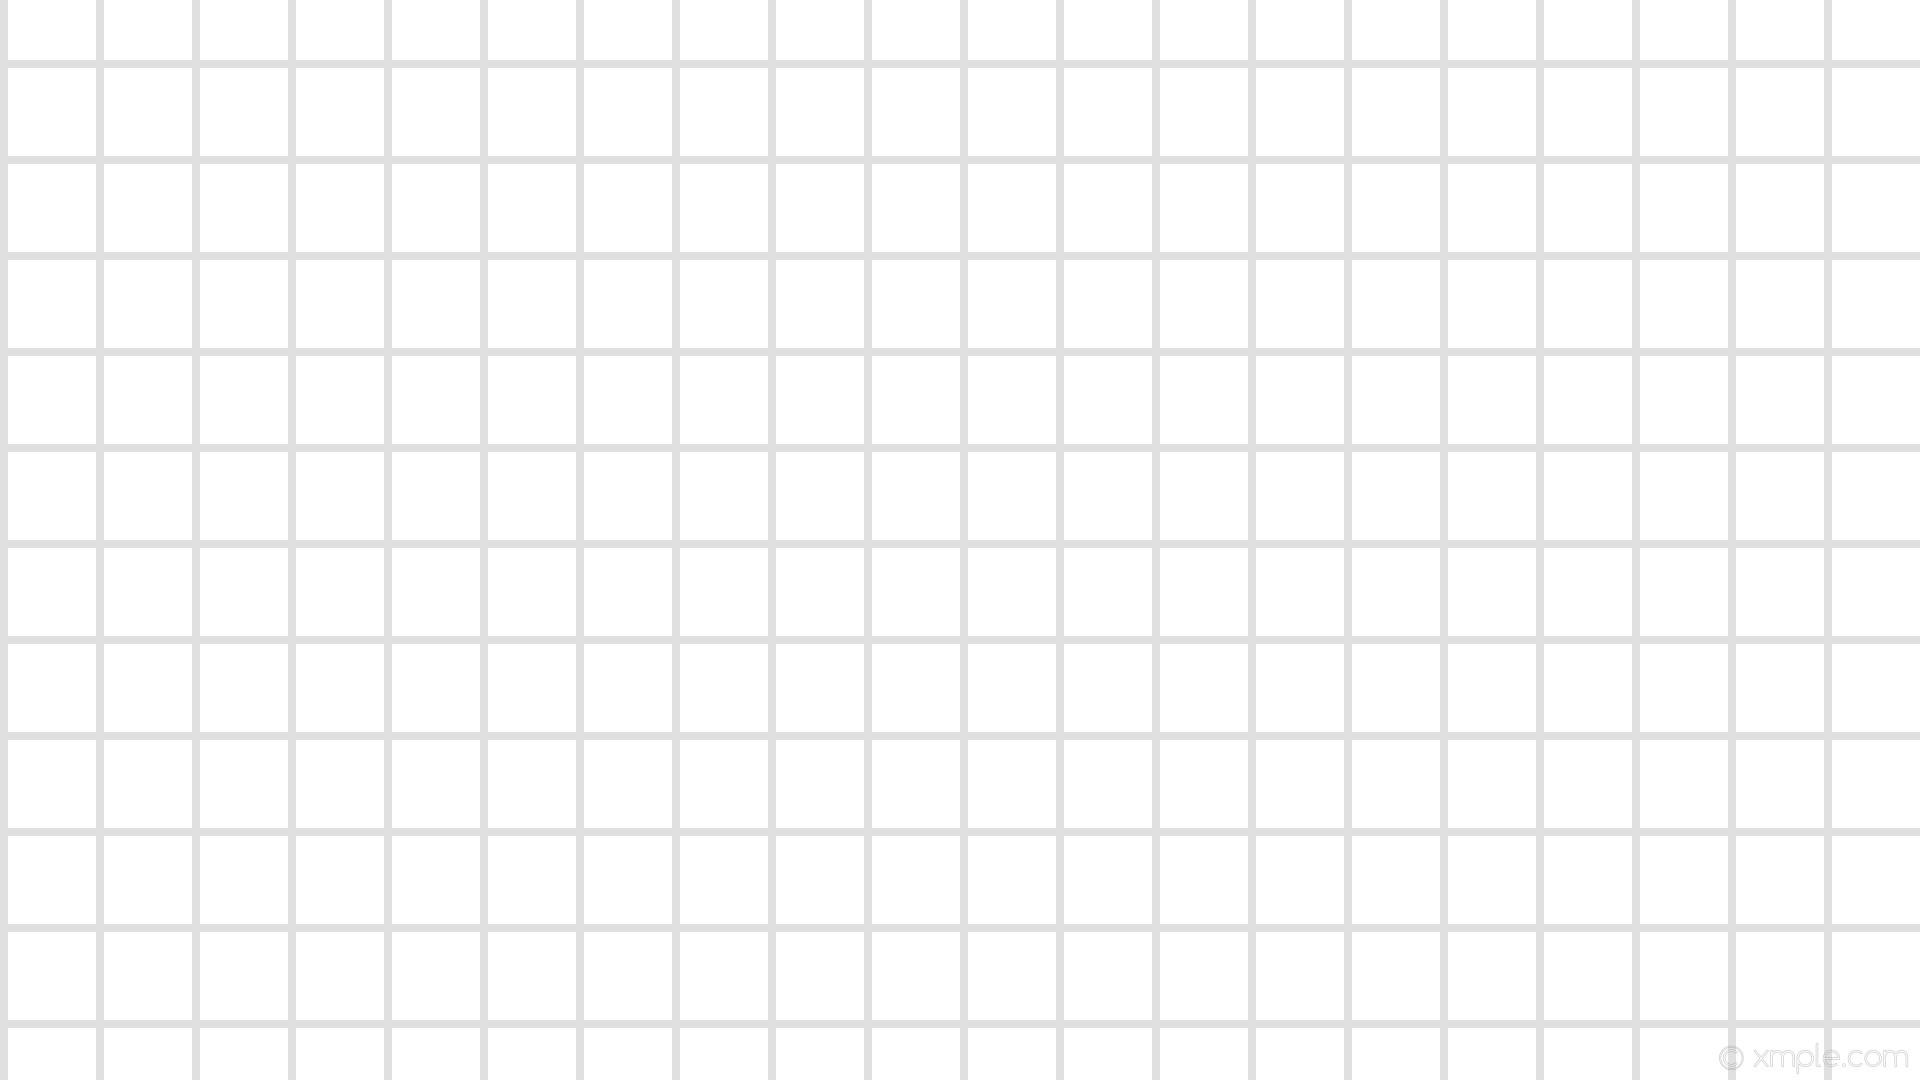 wallpaper graph paper white grey grid light gray #ffffff #d3d3d3 0° 8px 96px